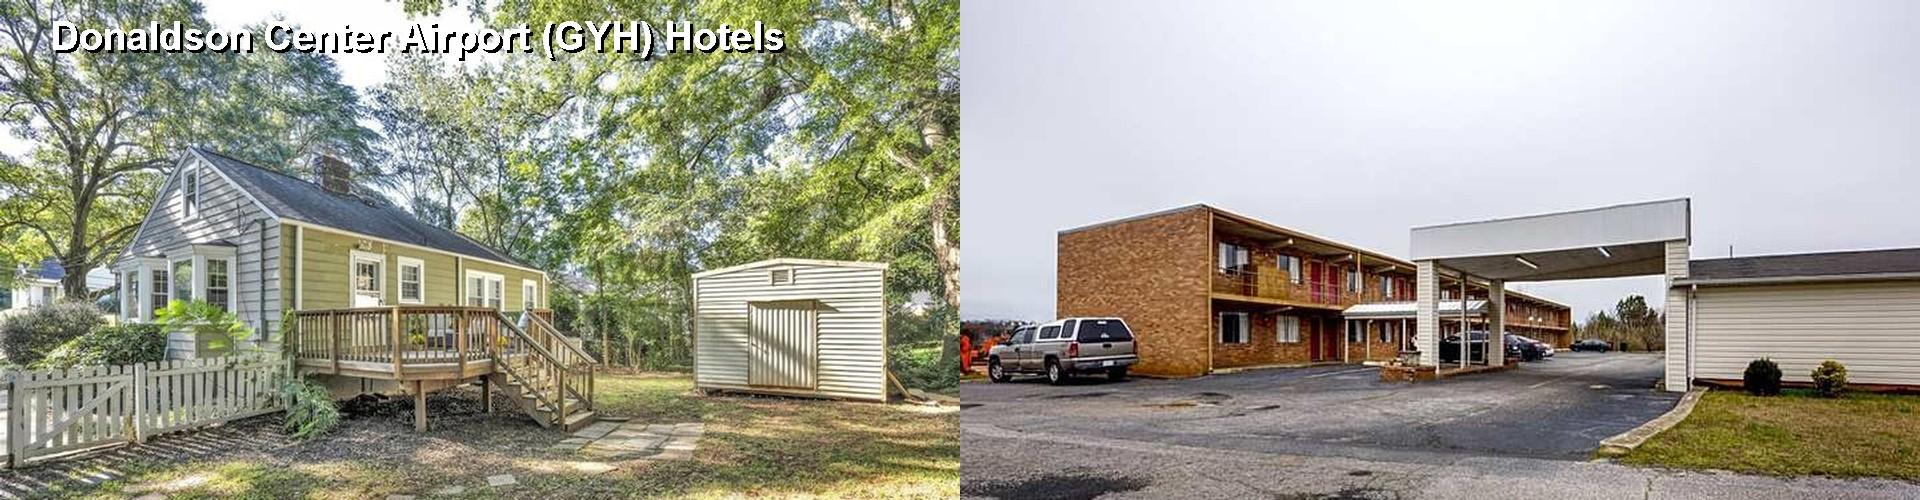 2 Best Hotels Near Donaldson Center Airport Gyh